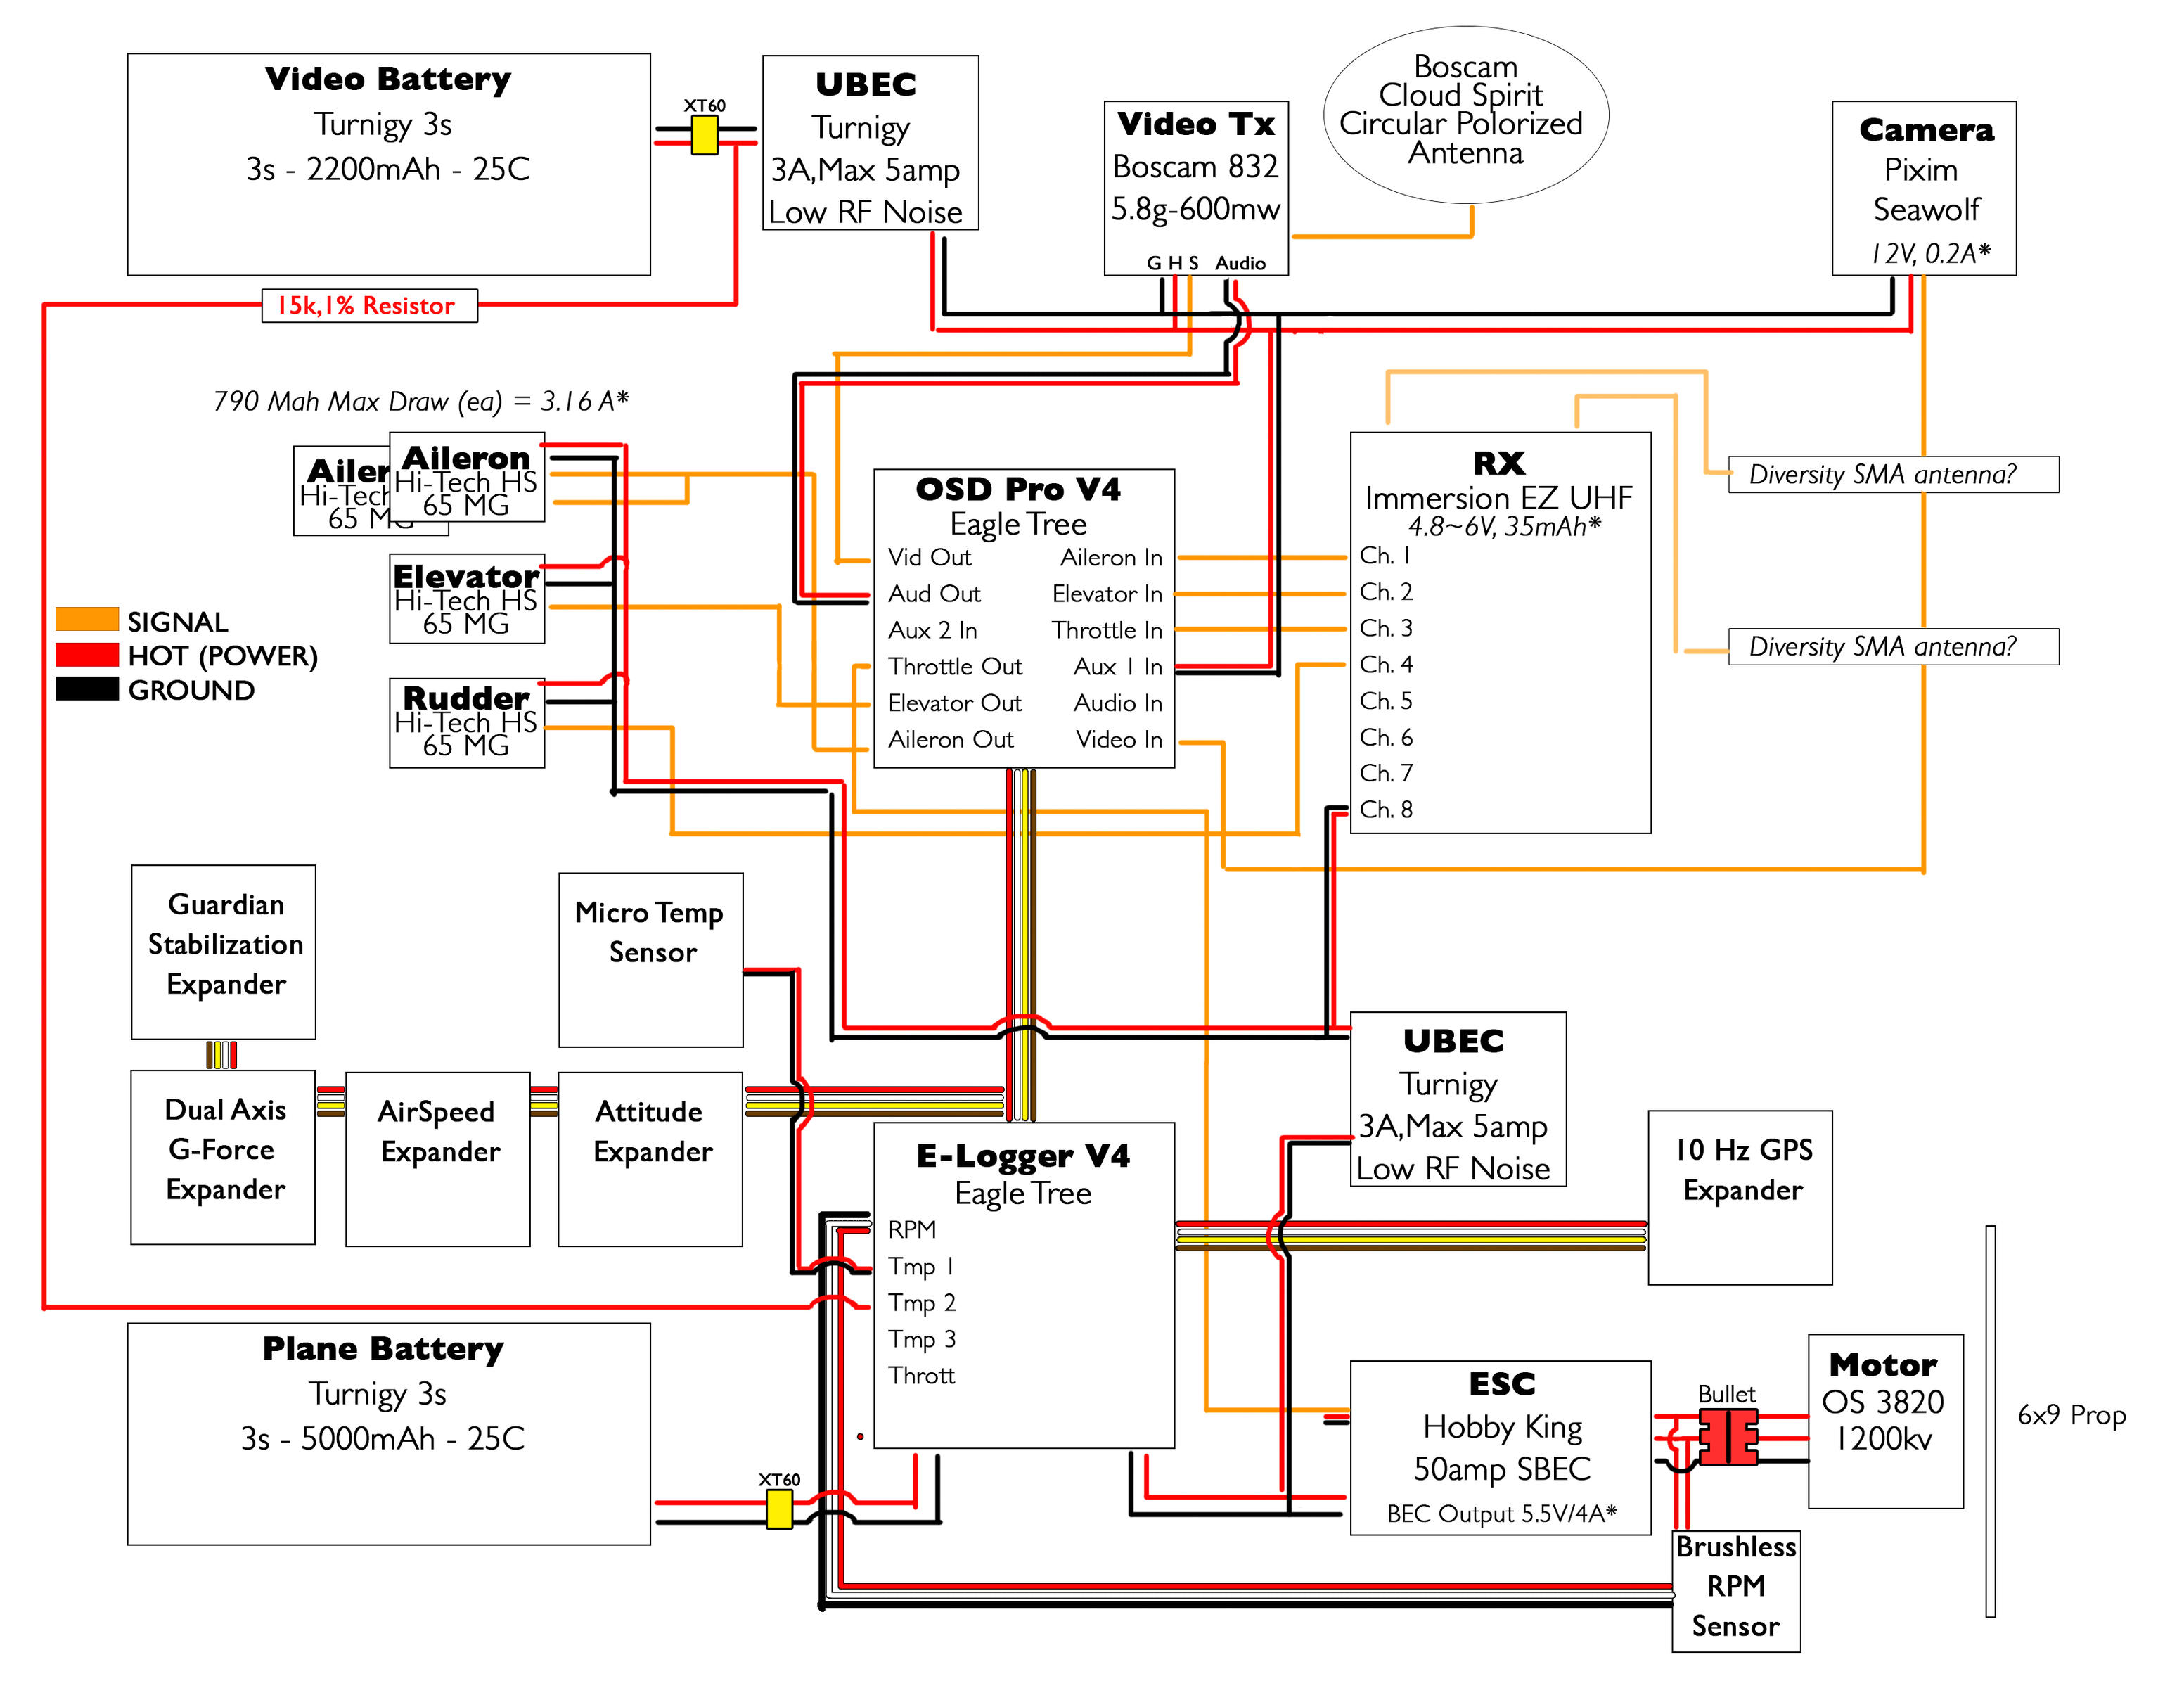 a6784601 56 Skywalker EagleTree OSD%2CBoscam832%2CImmersionEZUHF Wiring Diagram?d\=1400681432 osd pro wiring diagram ladder diagram \u2022 wiring diagram database  at edmiracle.co